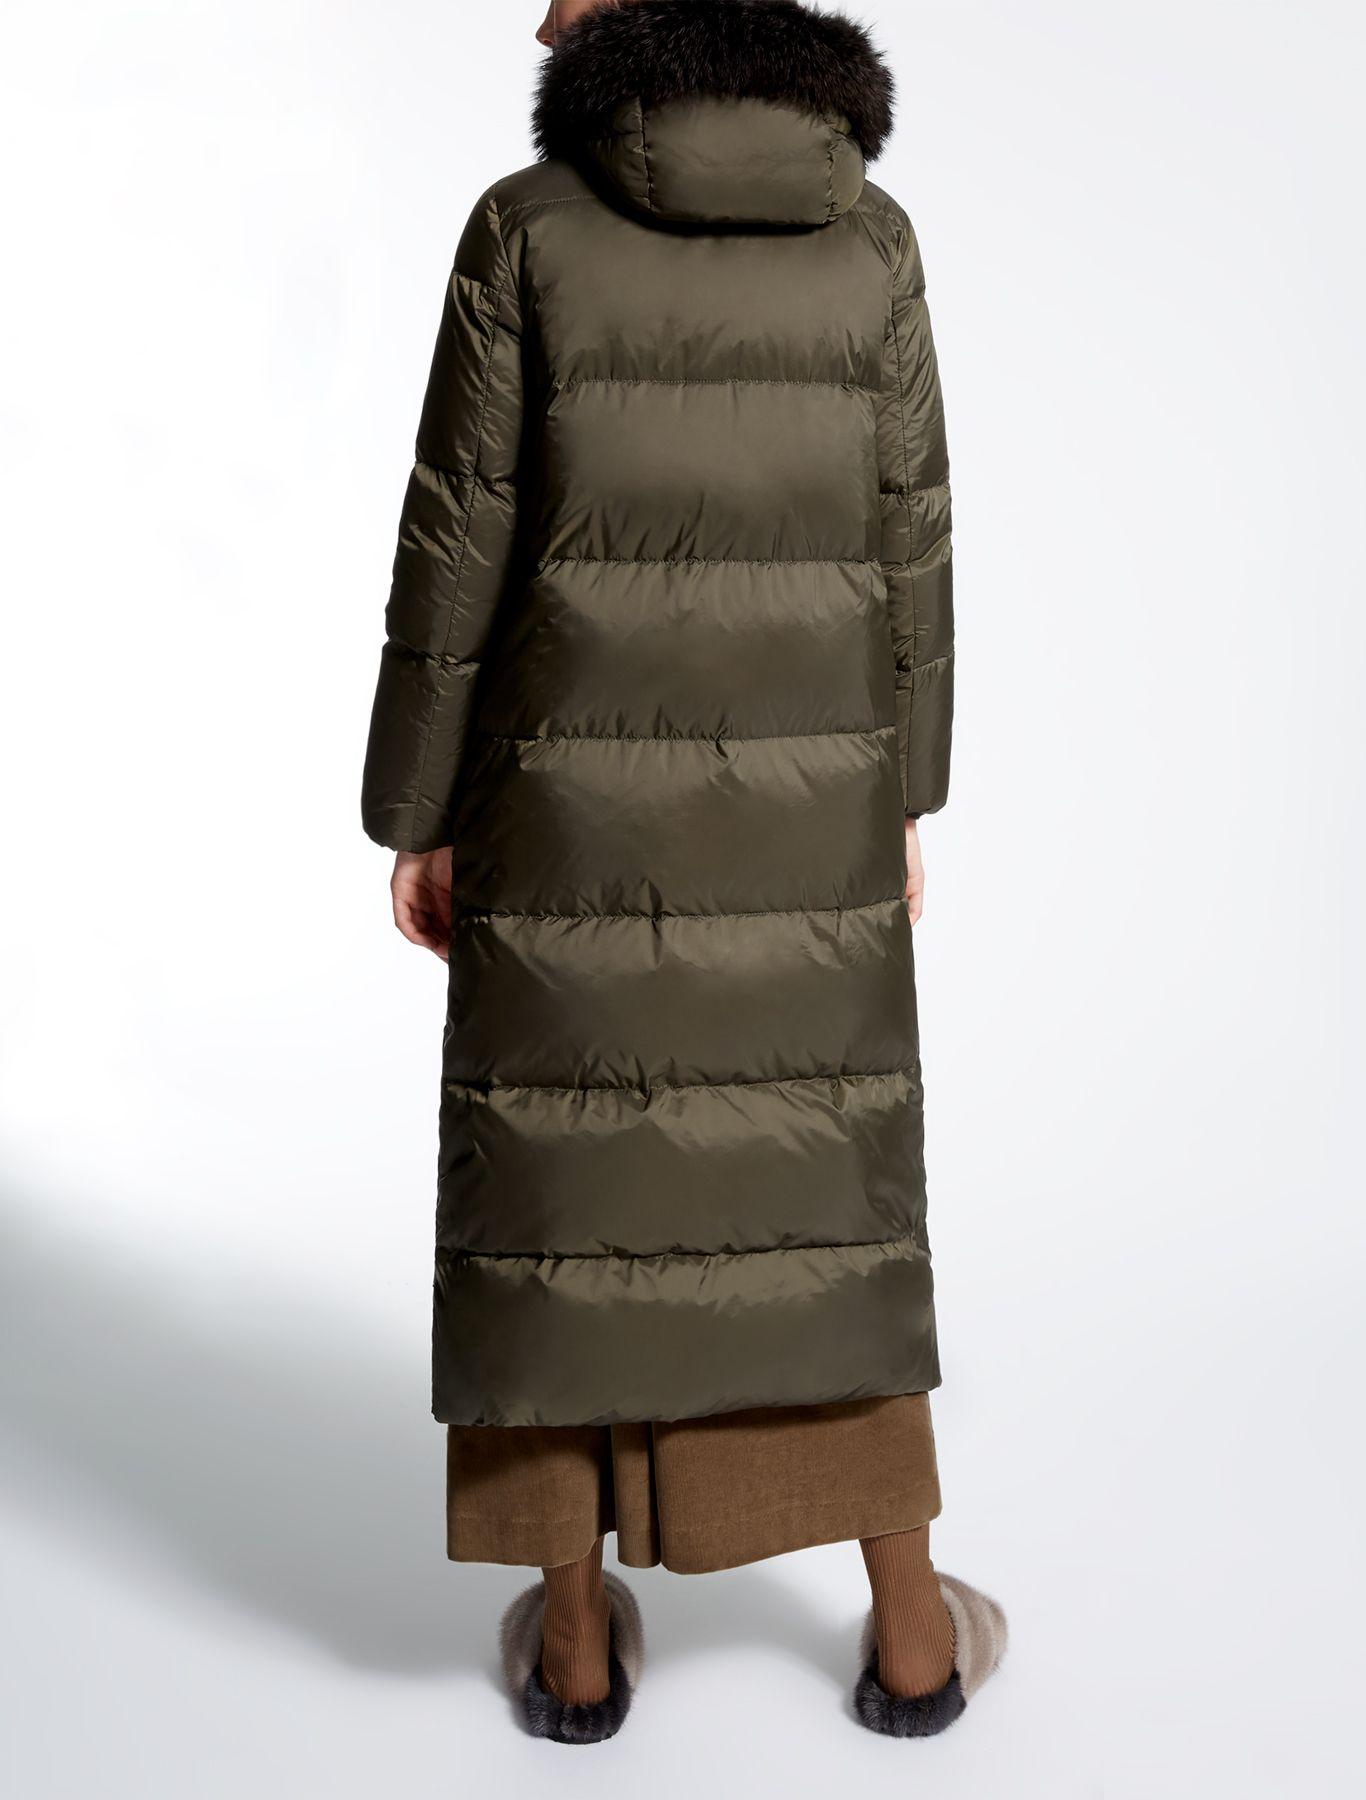 Max Mara Gel Kaki Drop Proof Canvas Down Jacket Puffer Coat Outfit Max Mara Down Jacket [ 1800 x 1366 Pixel ]